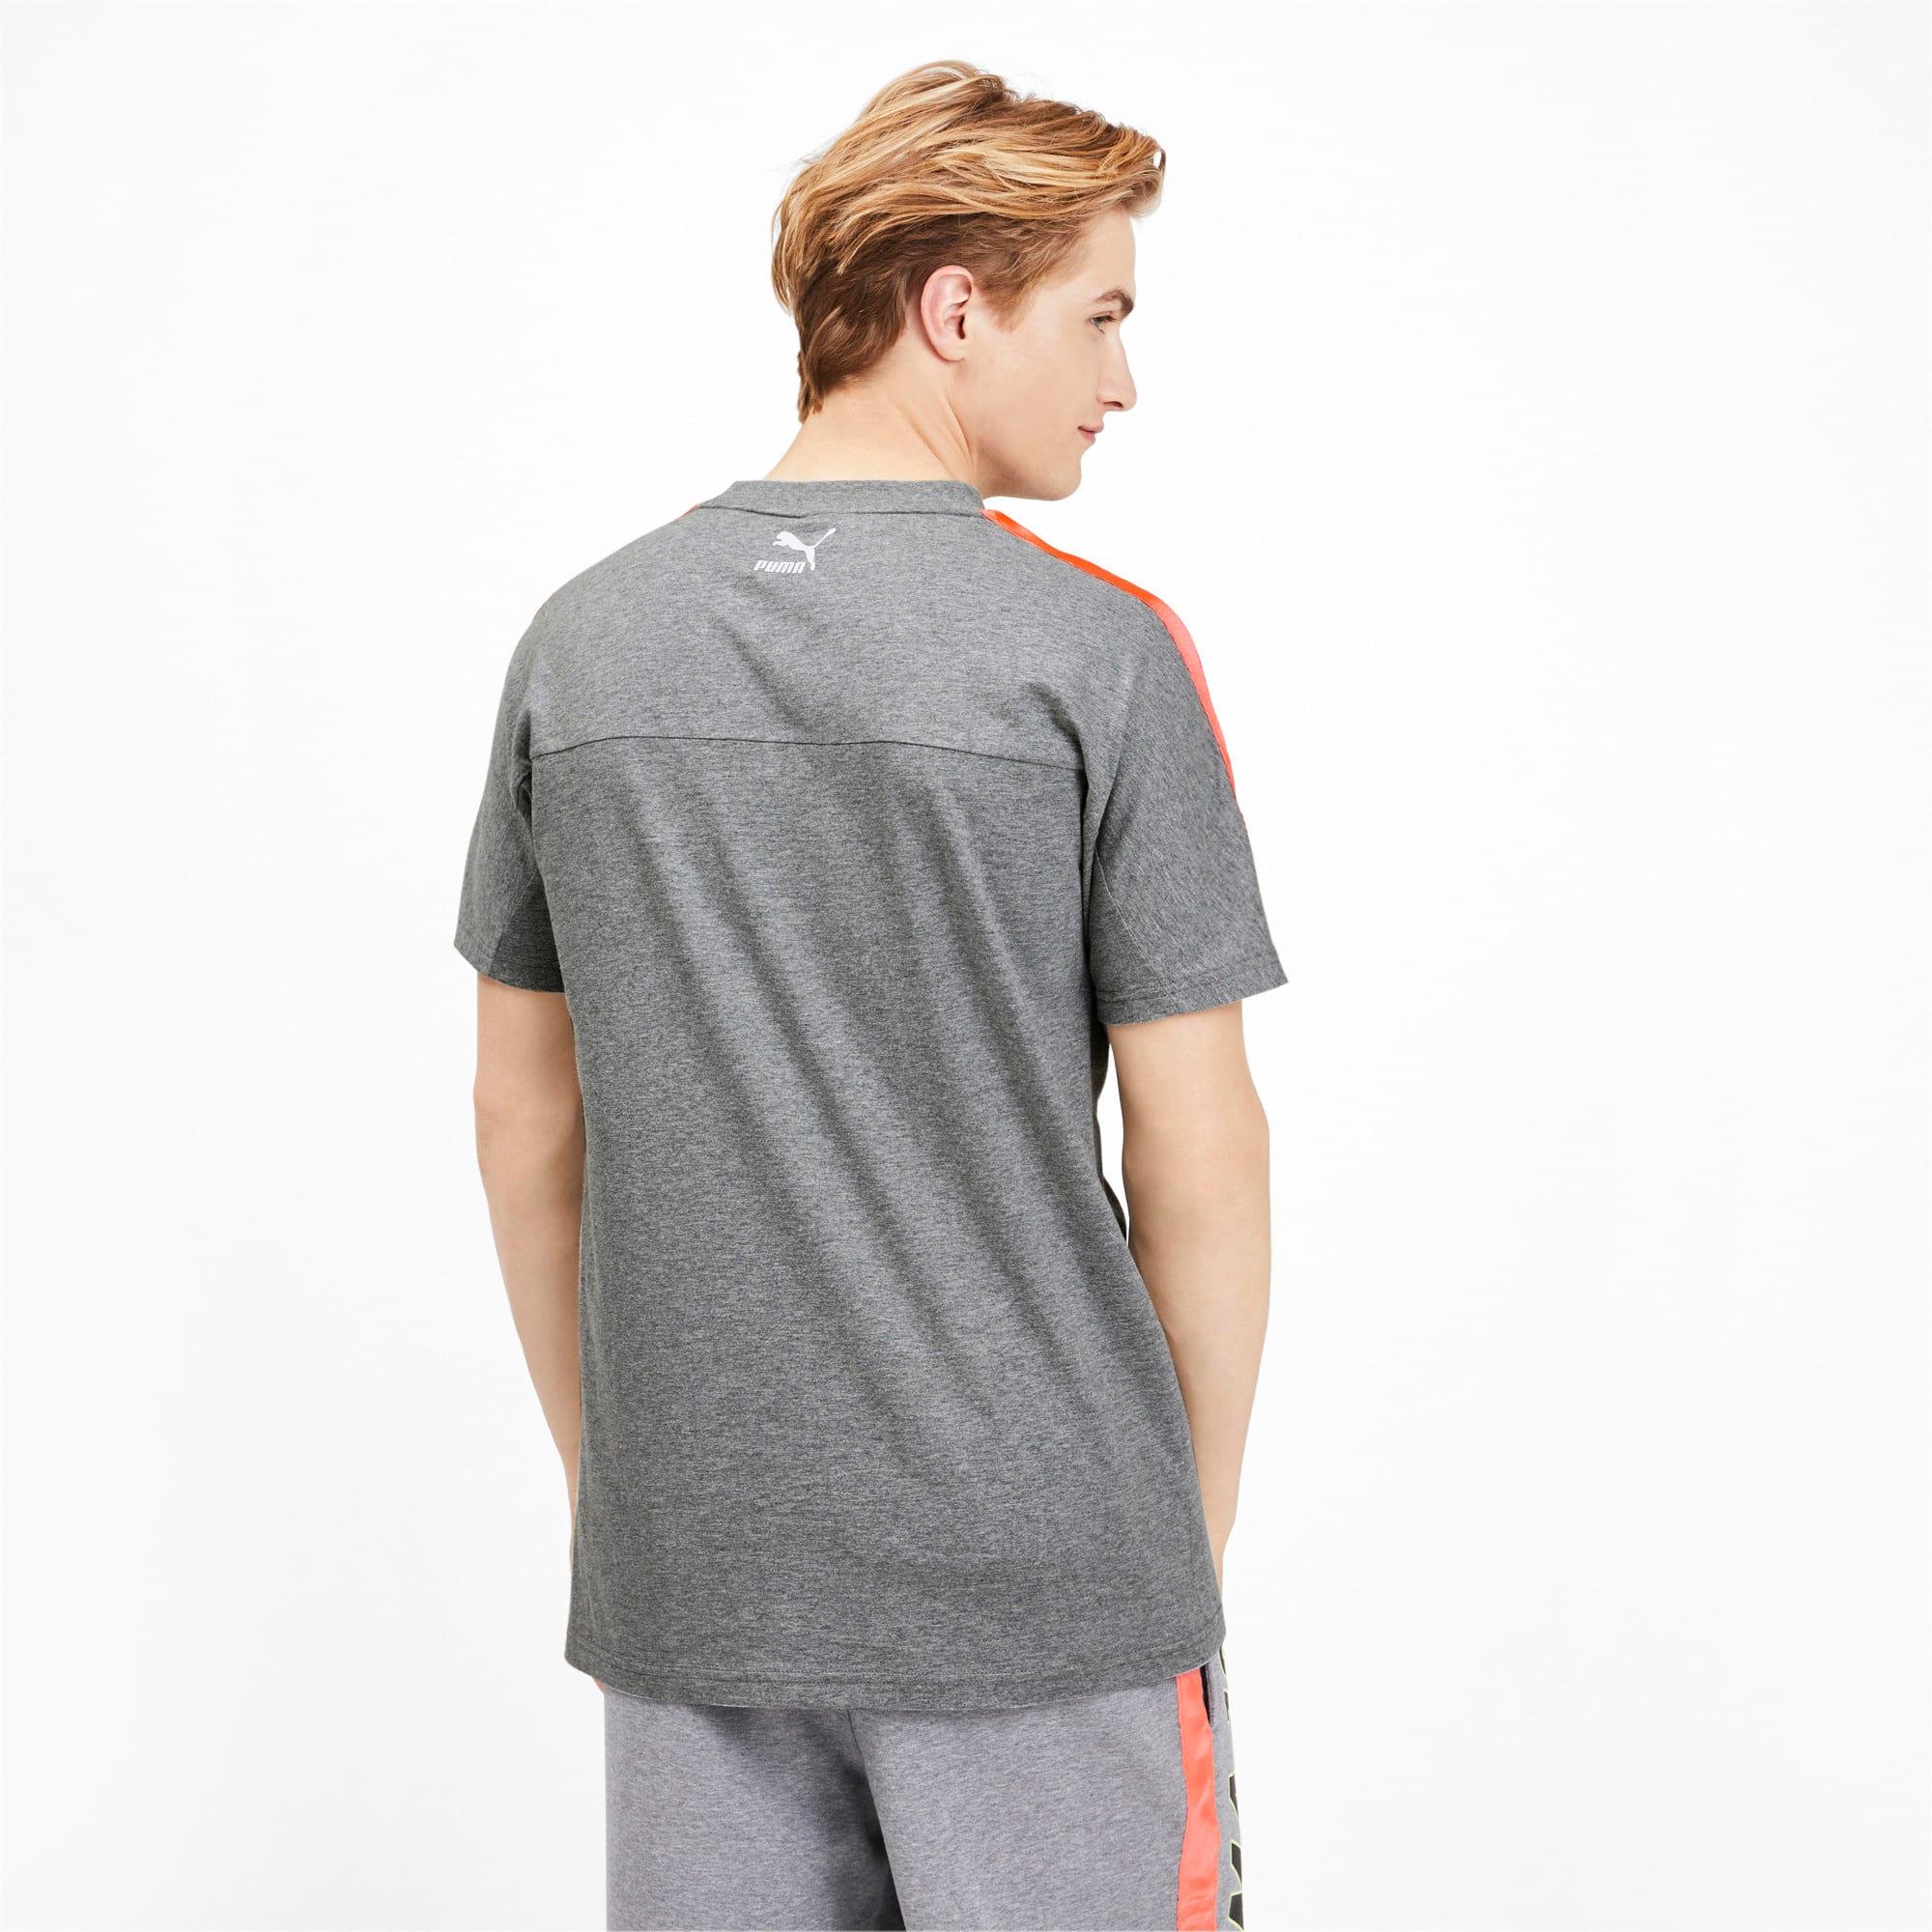 Miniatura 2 de Camiseta luXTG para hombre, Medium Gray Heather, mediano